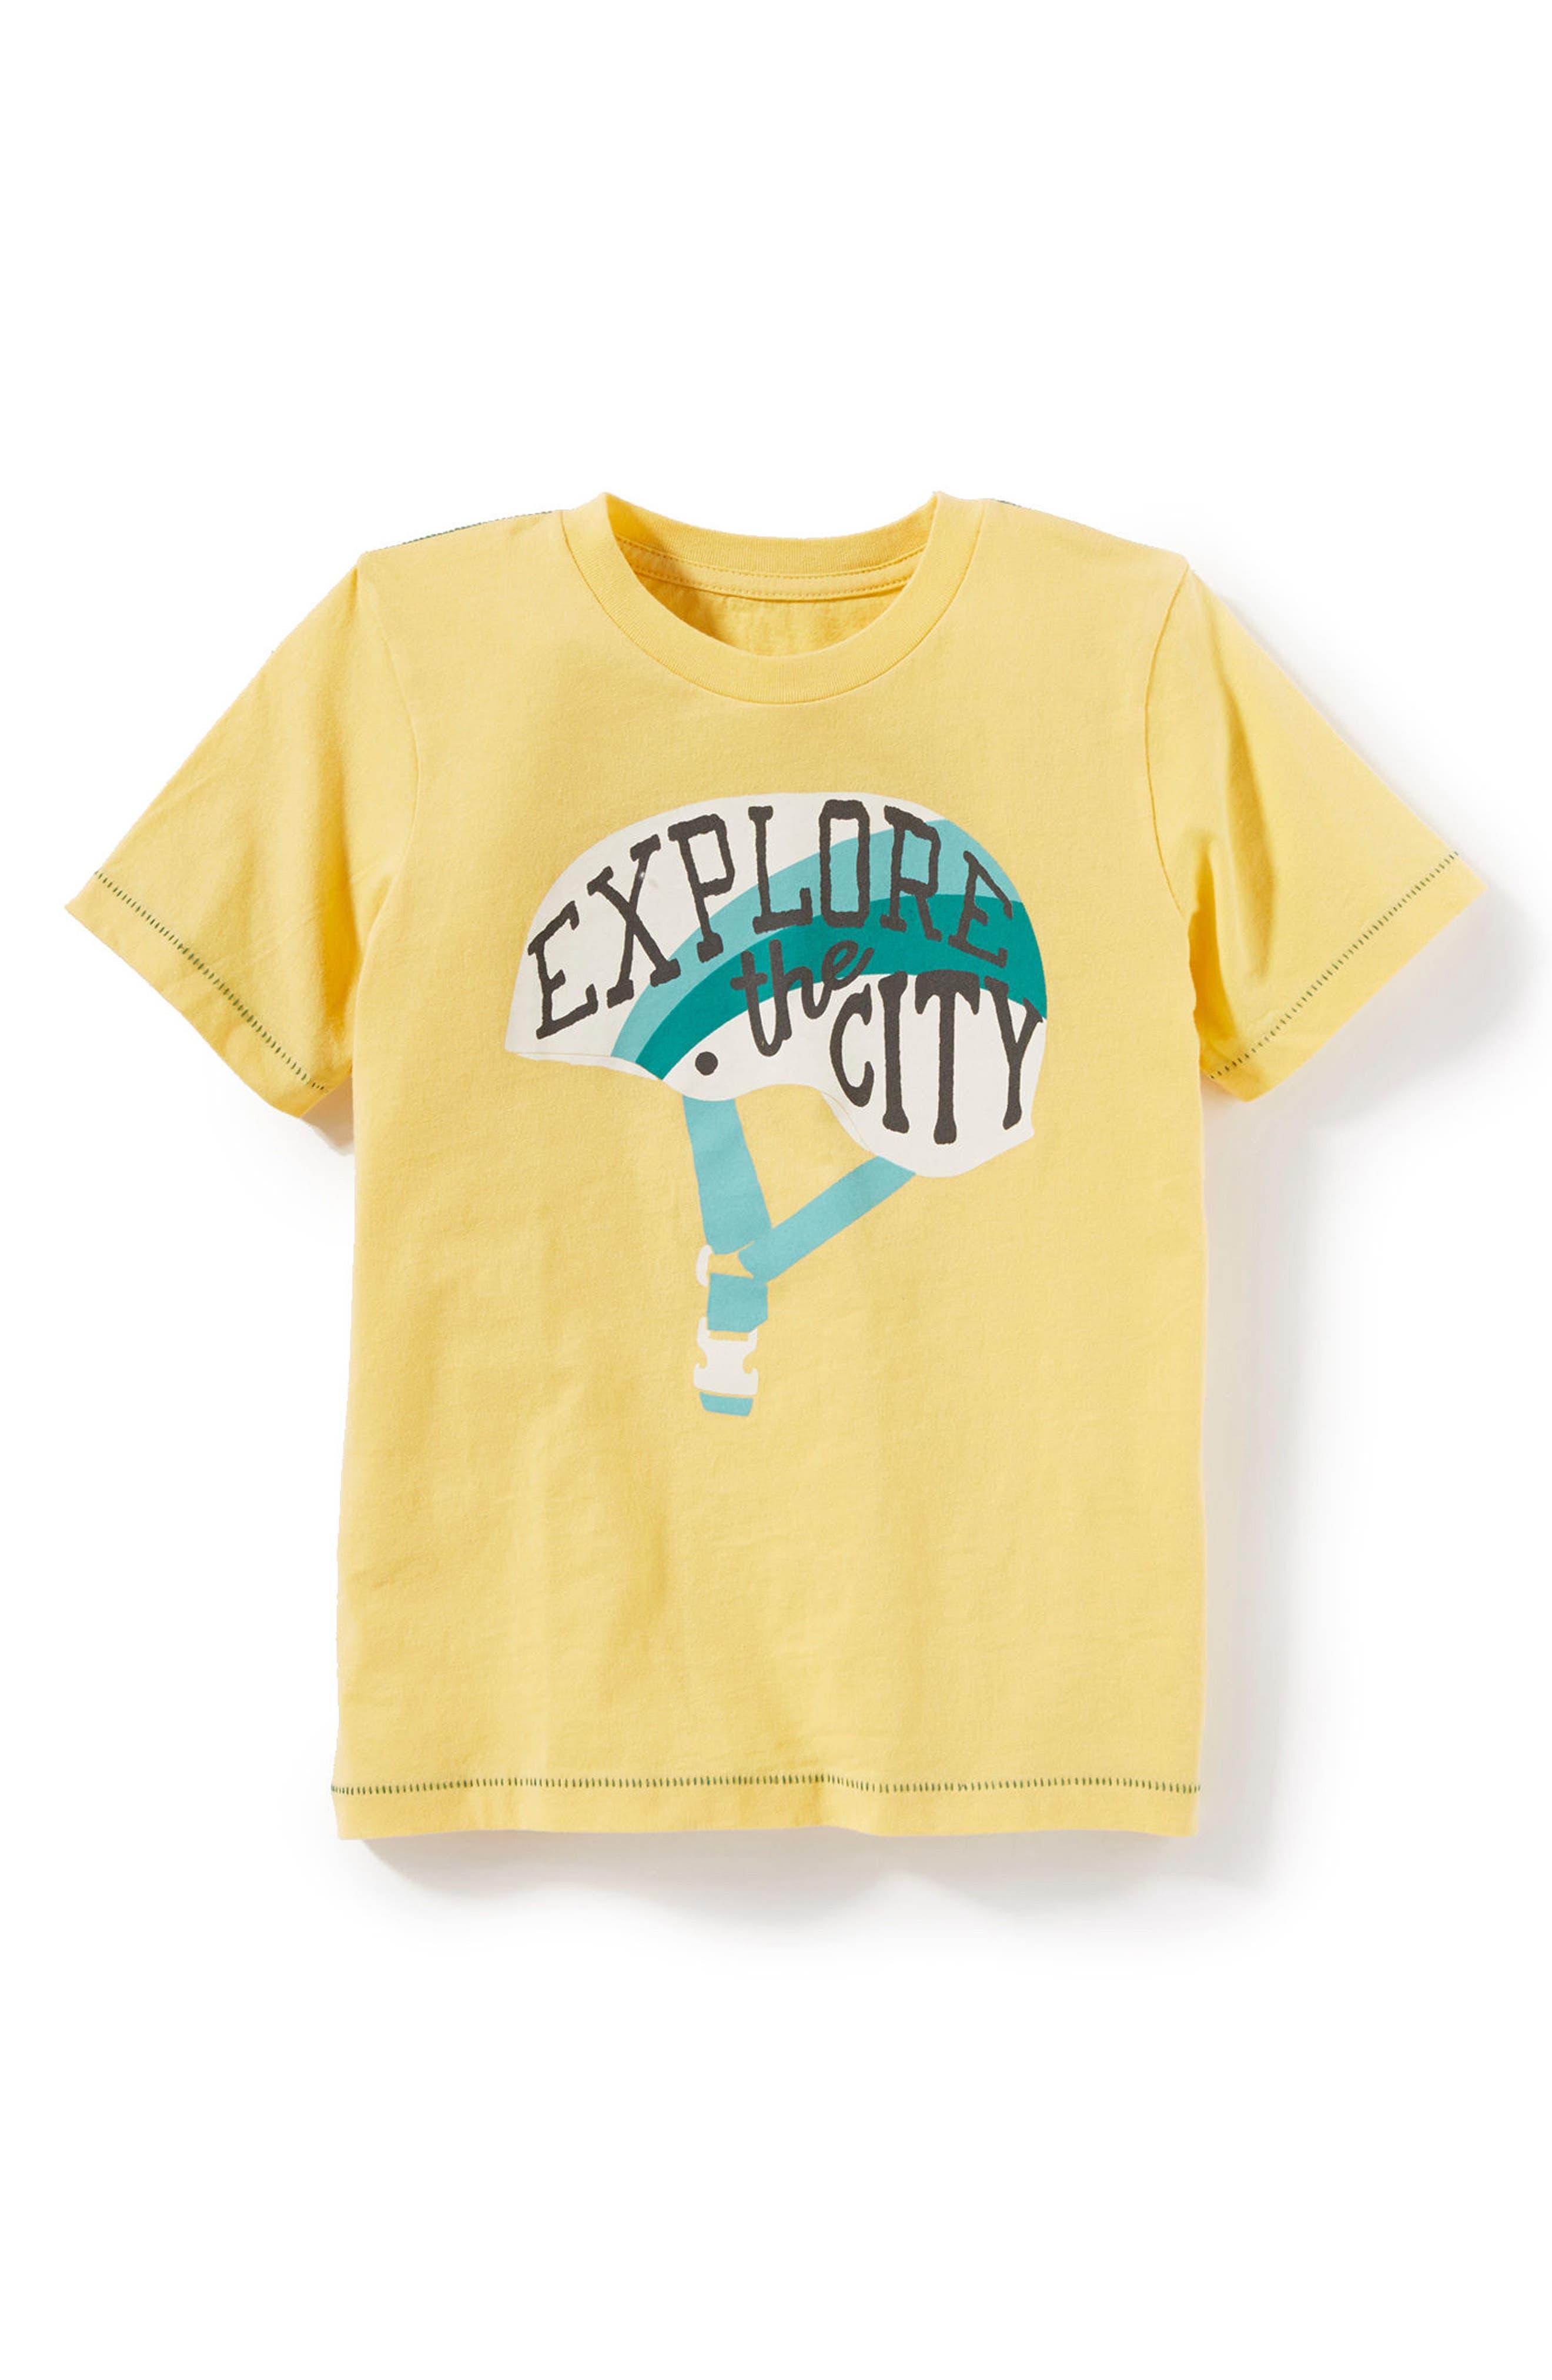 Main Image - Peek Explore the City Graphic T-Shirt (Toddler Boys, Little Boys & Big Boys)